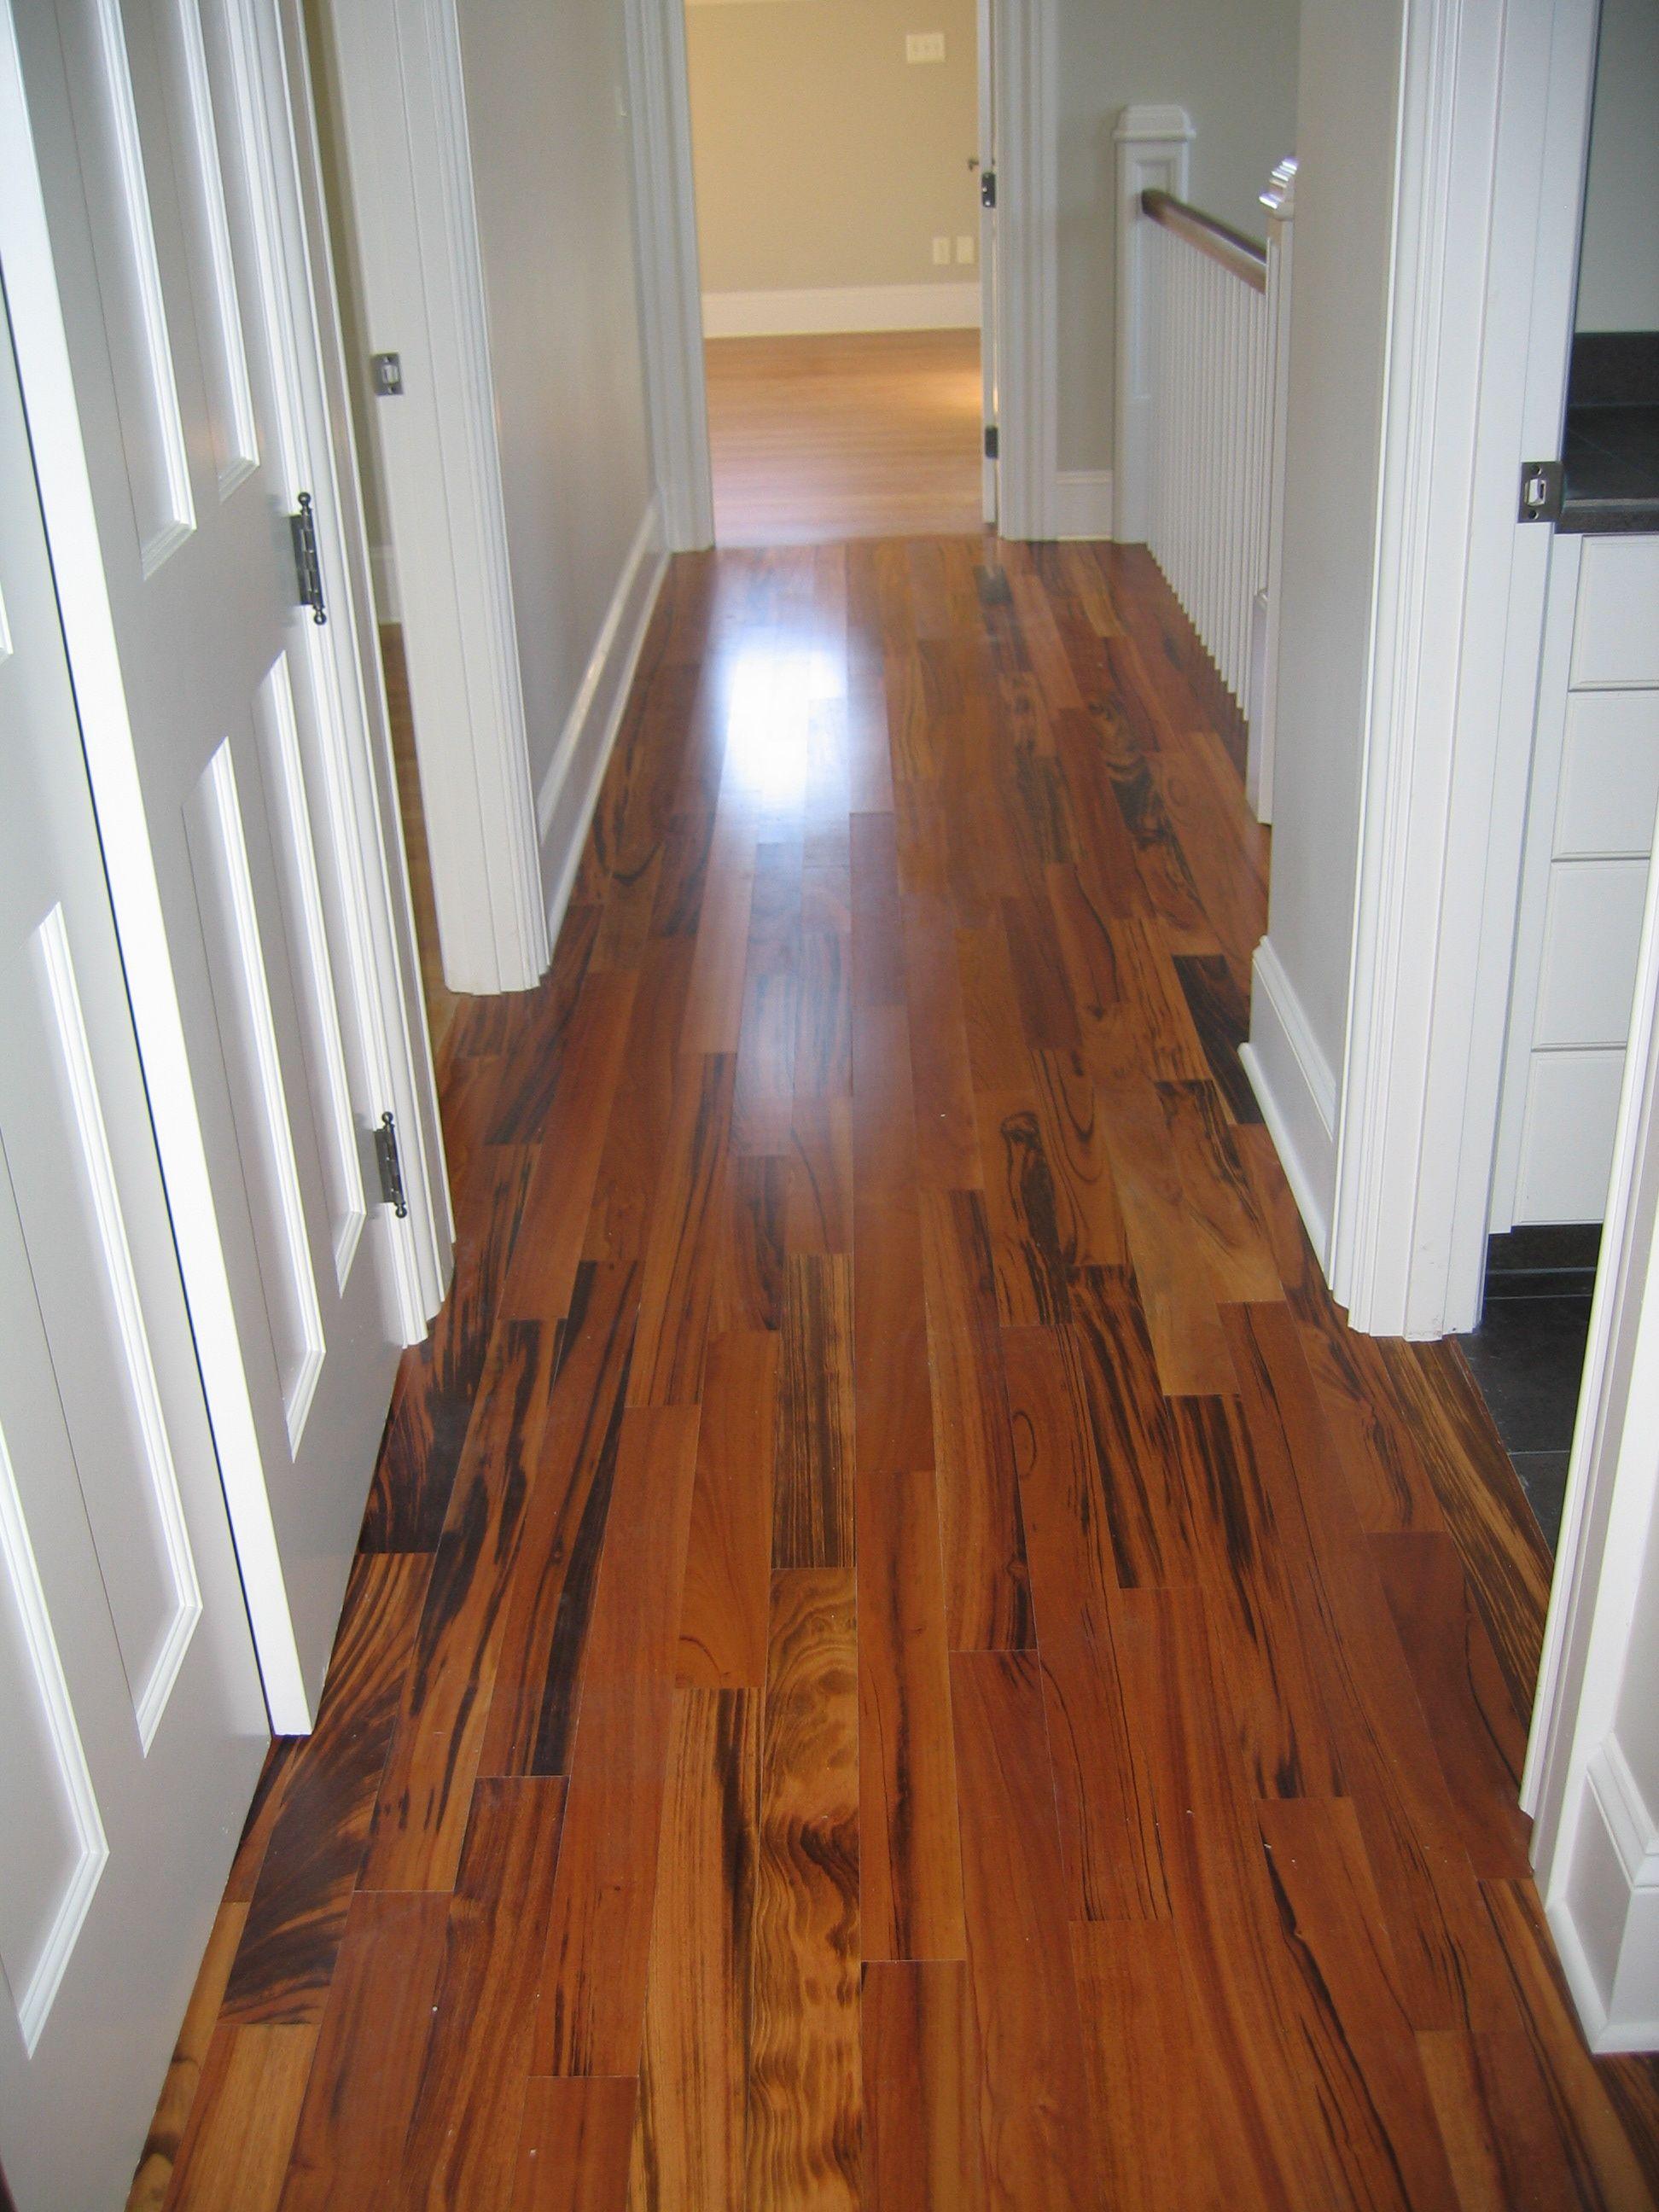 Natural Light Shining On Newly Installed Tigerwood Flooring